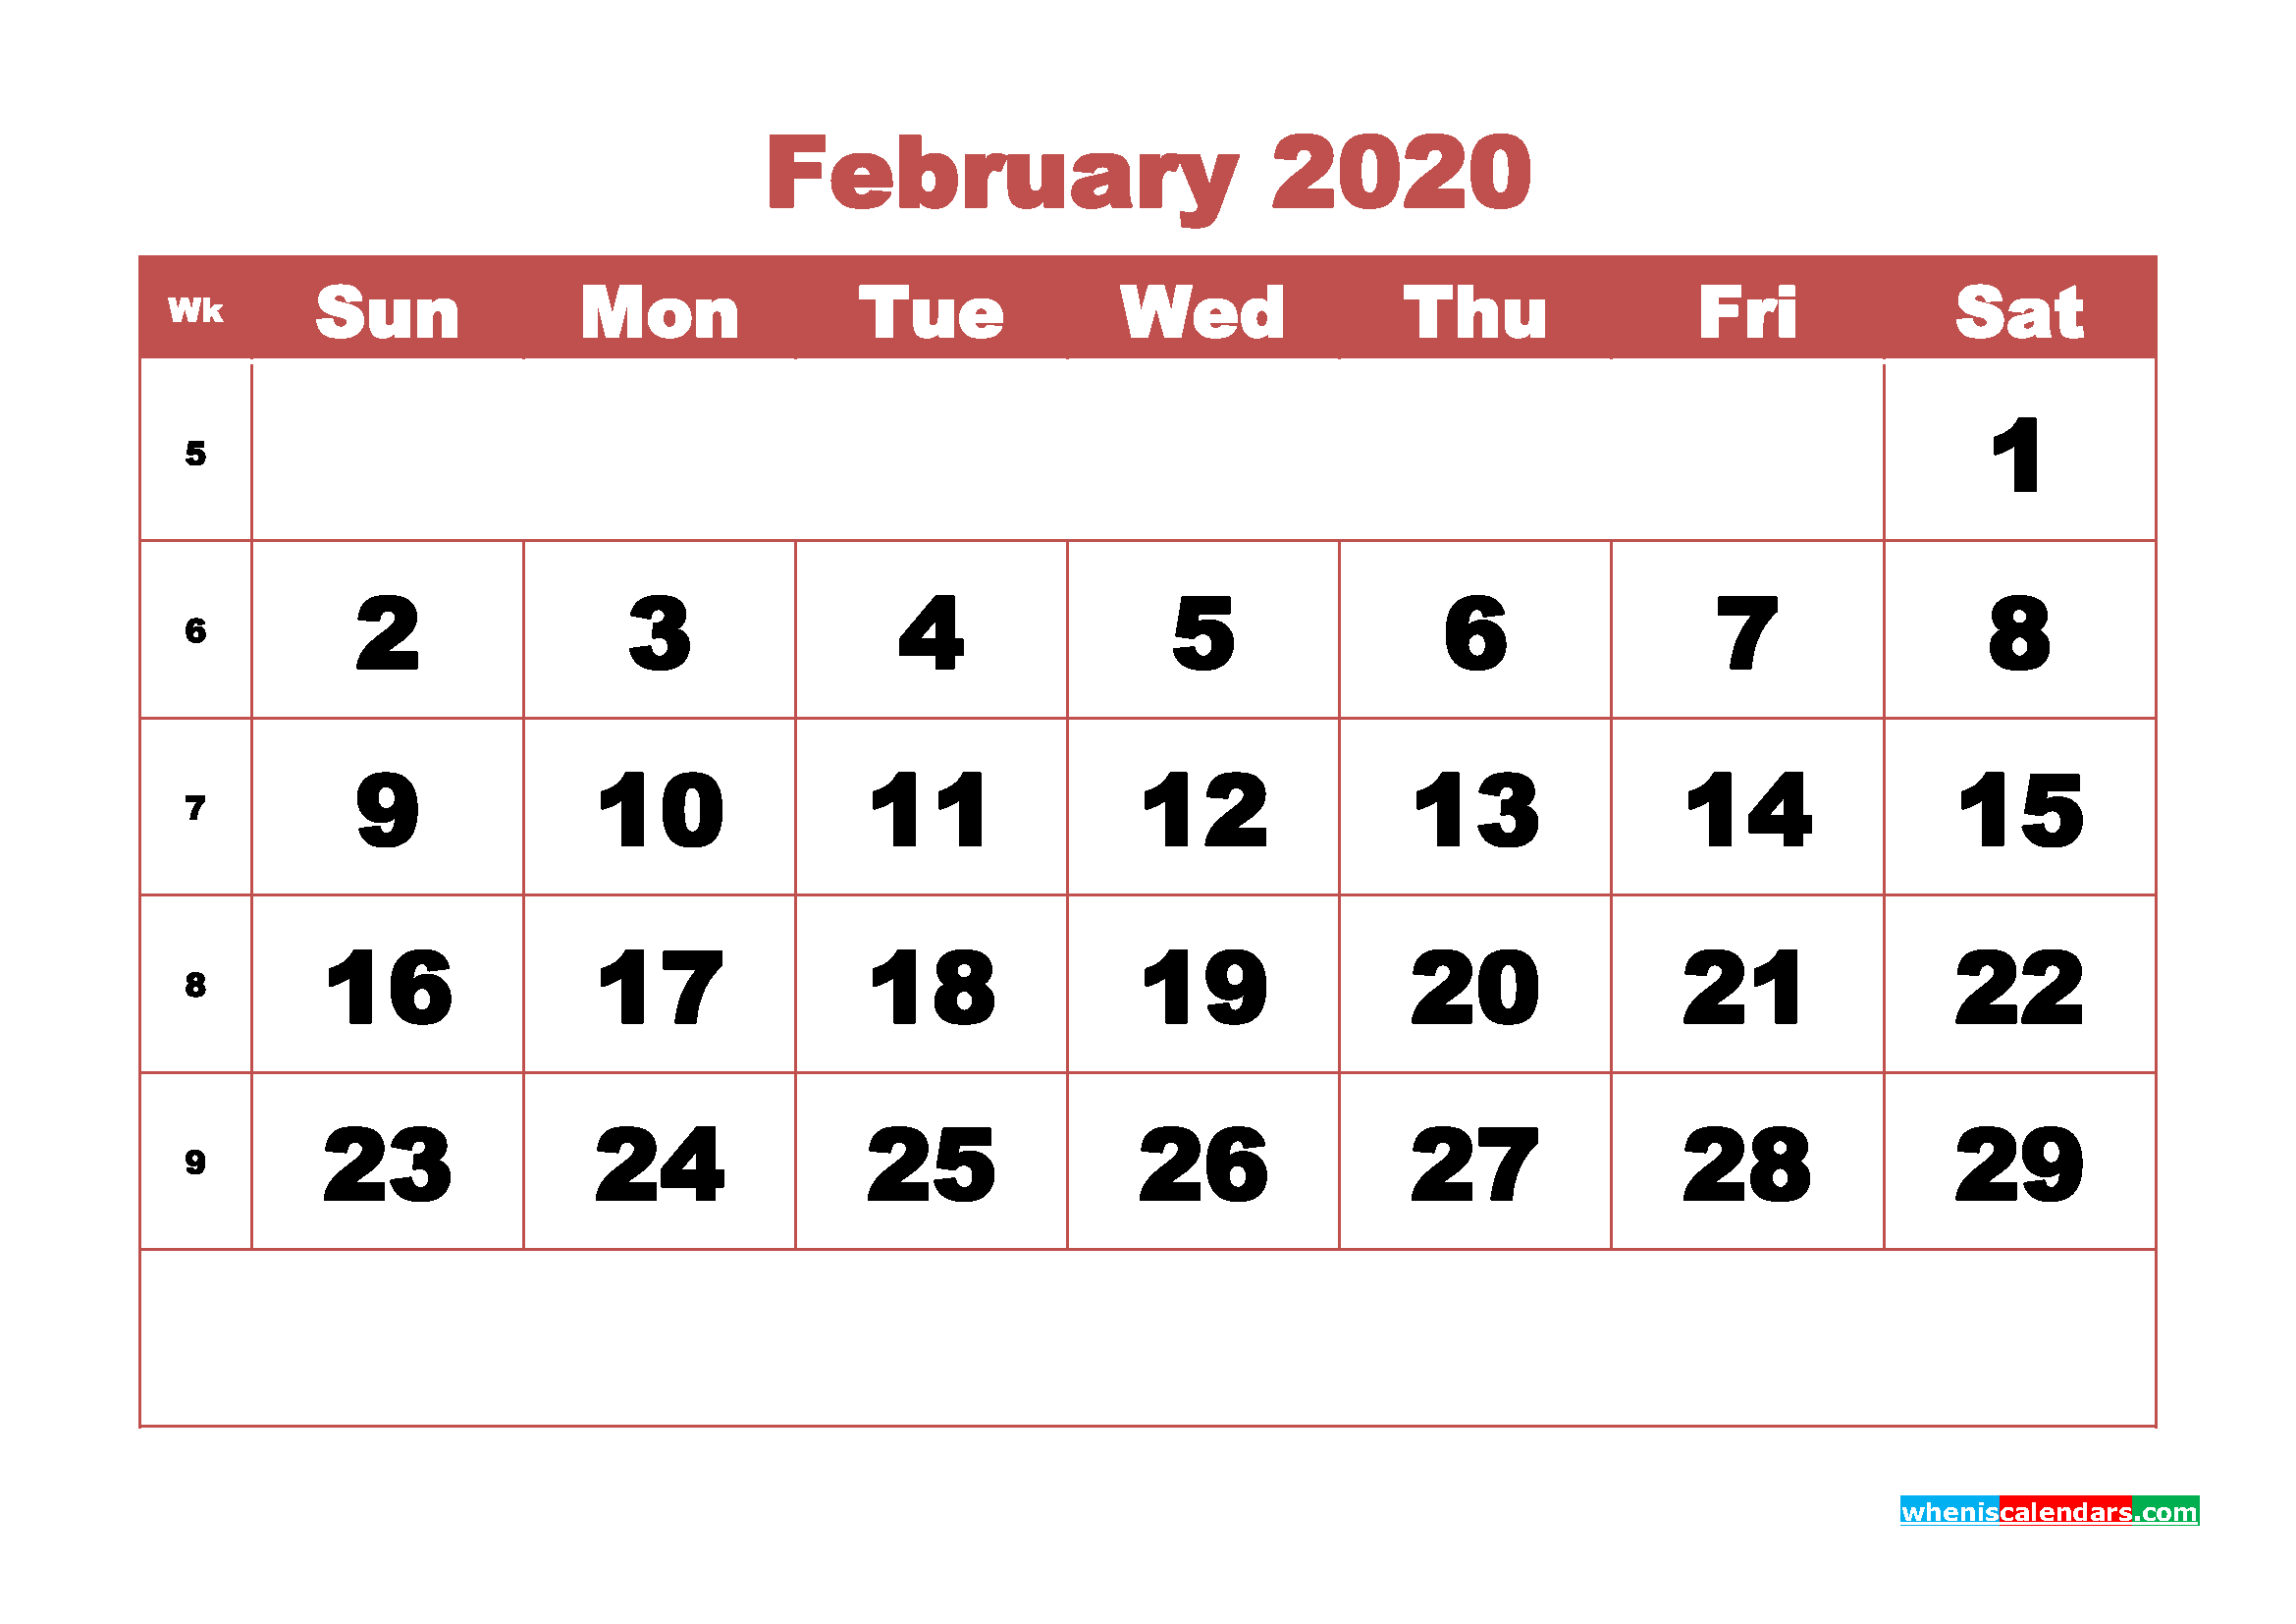 Free Blank Calendar February 2020 Printable - No.m20b326